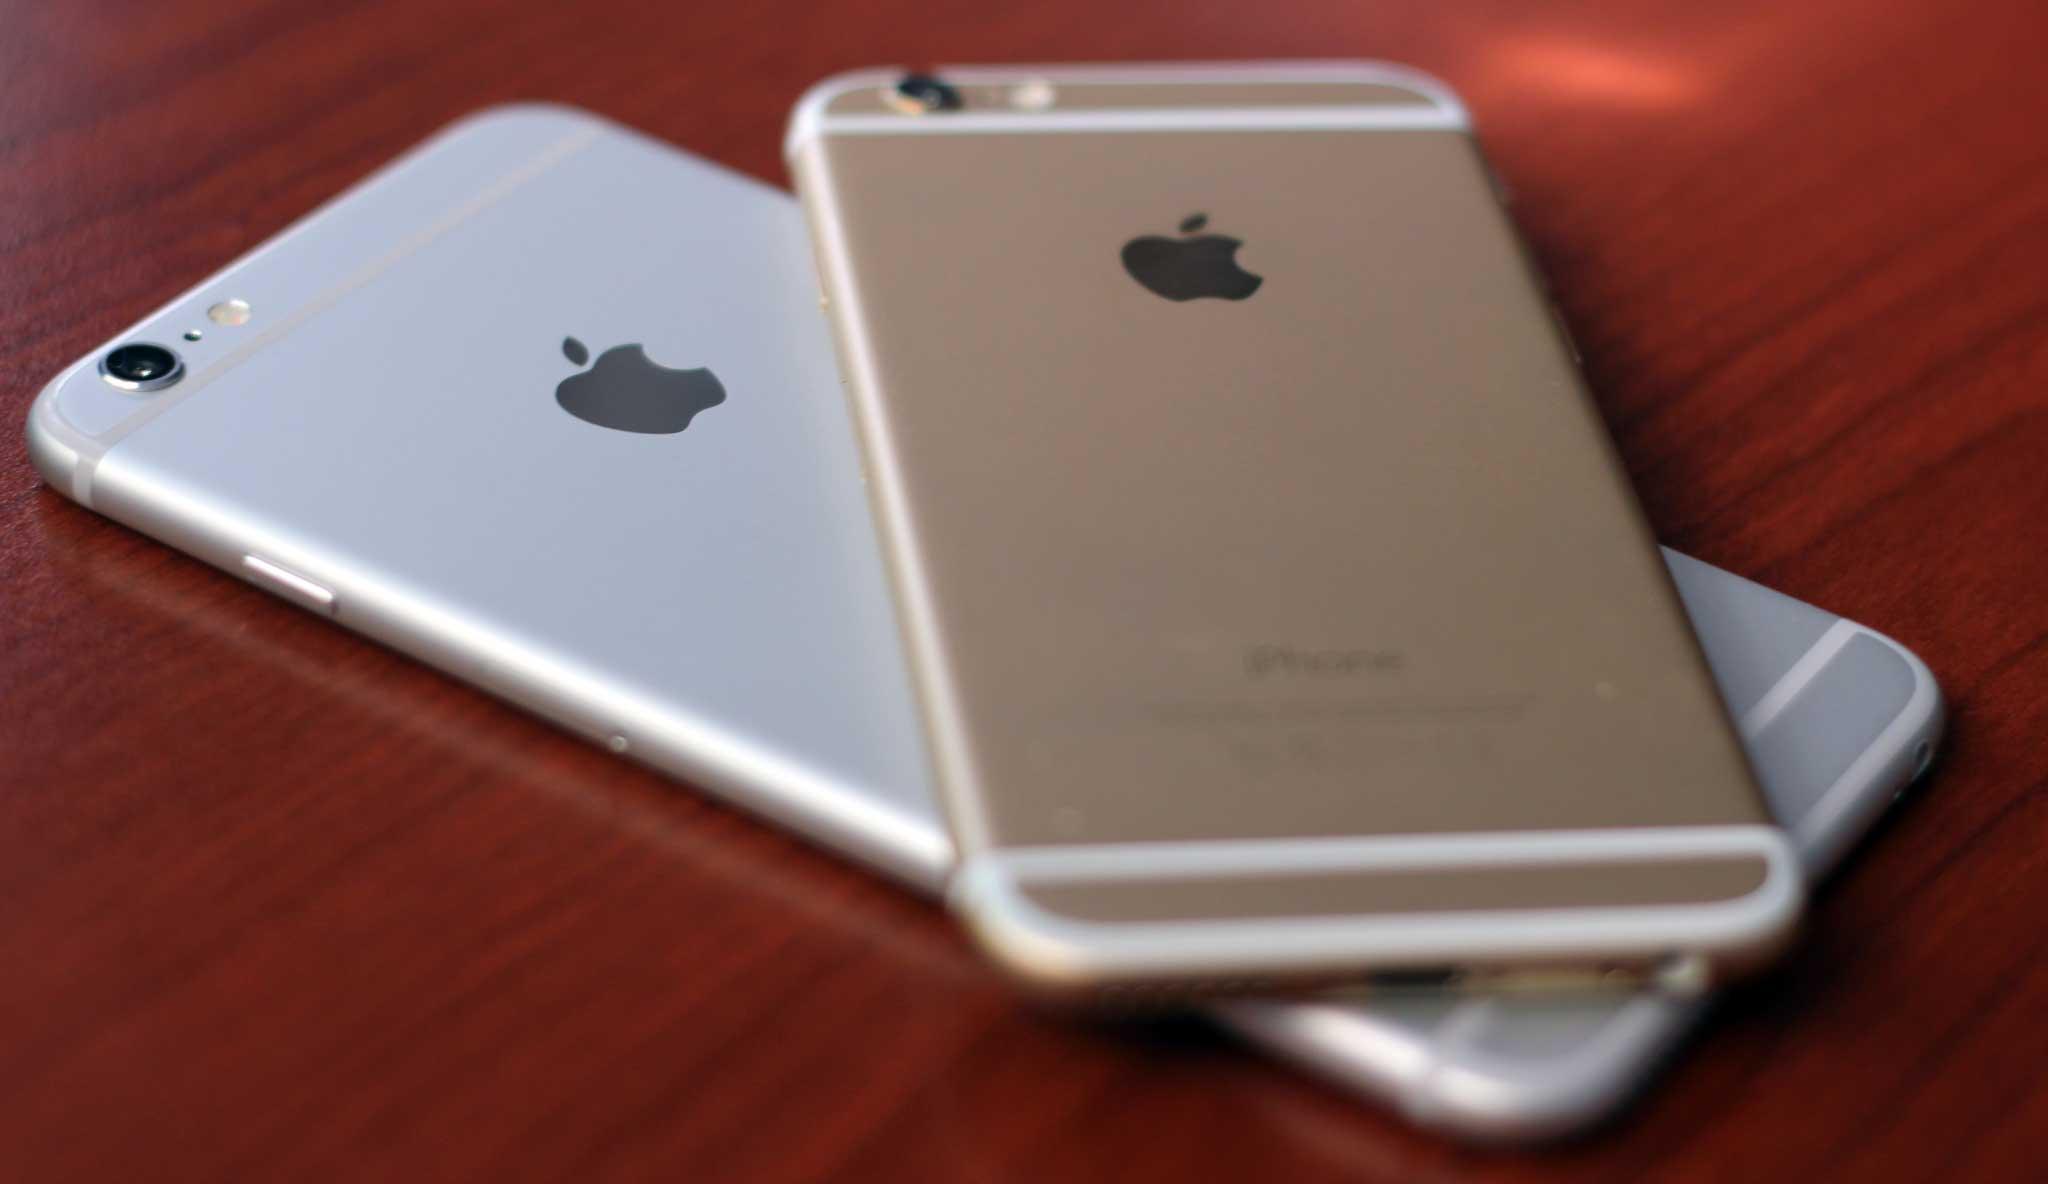 Photo of Chuyên Mở khóa iCloud iPhone 6/ Bẻ khóa iCloud 6 Plus